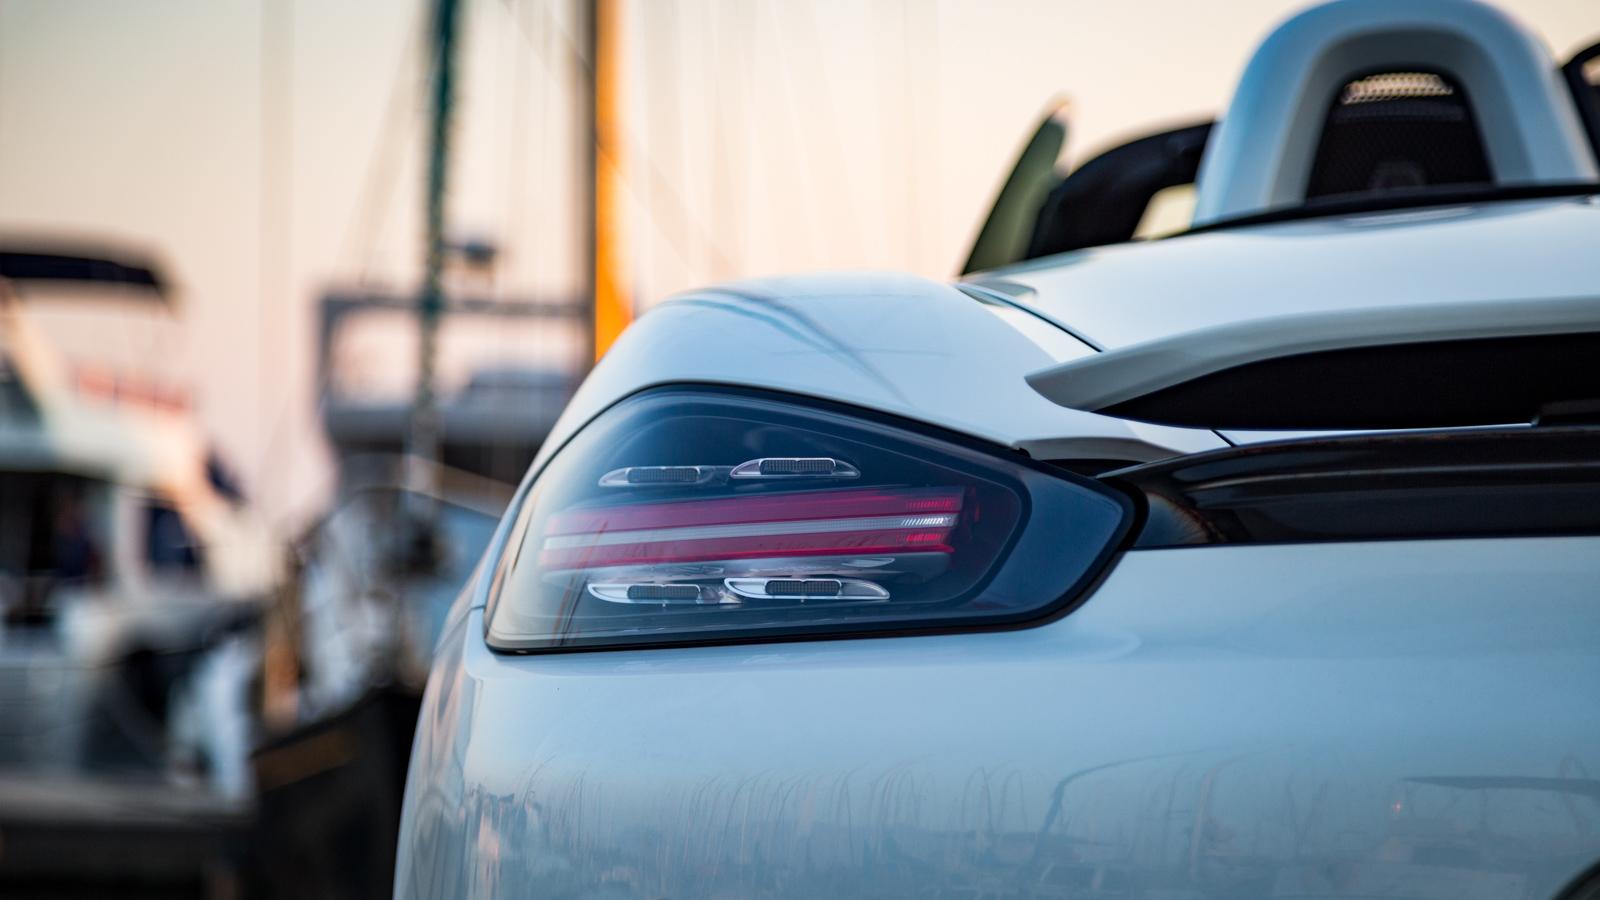 Test_Drive_Porsche_718_Boxster_20